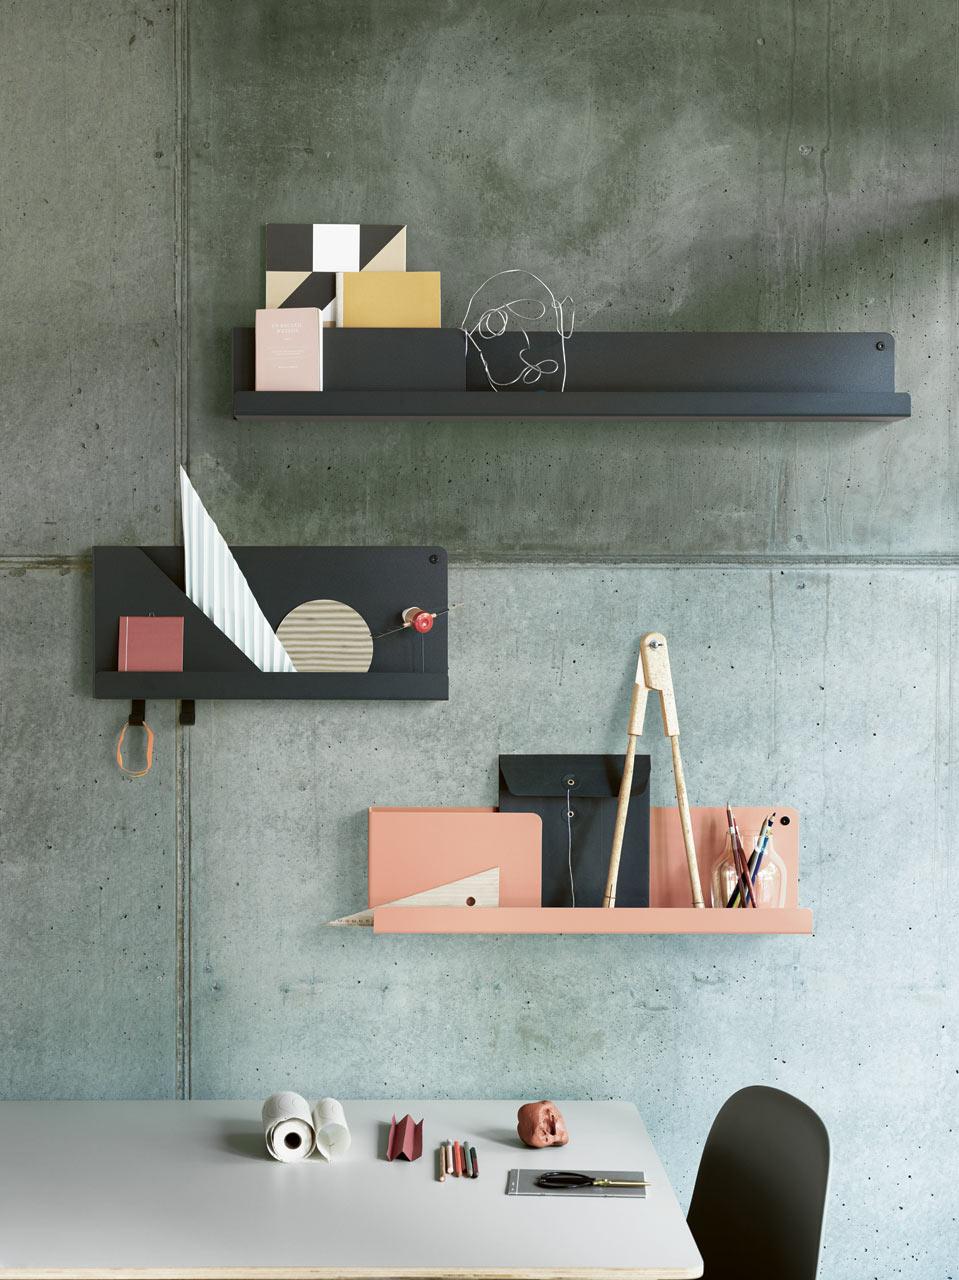 Folded-Shelf-Muuto-Johan-van-Hengel-17